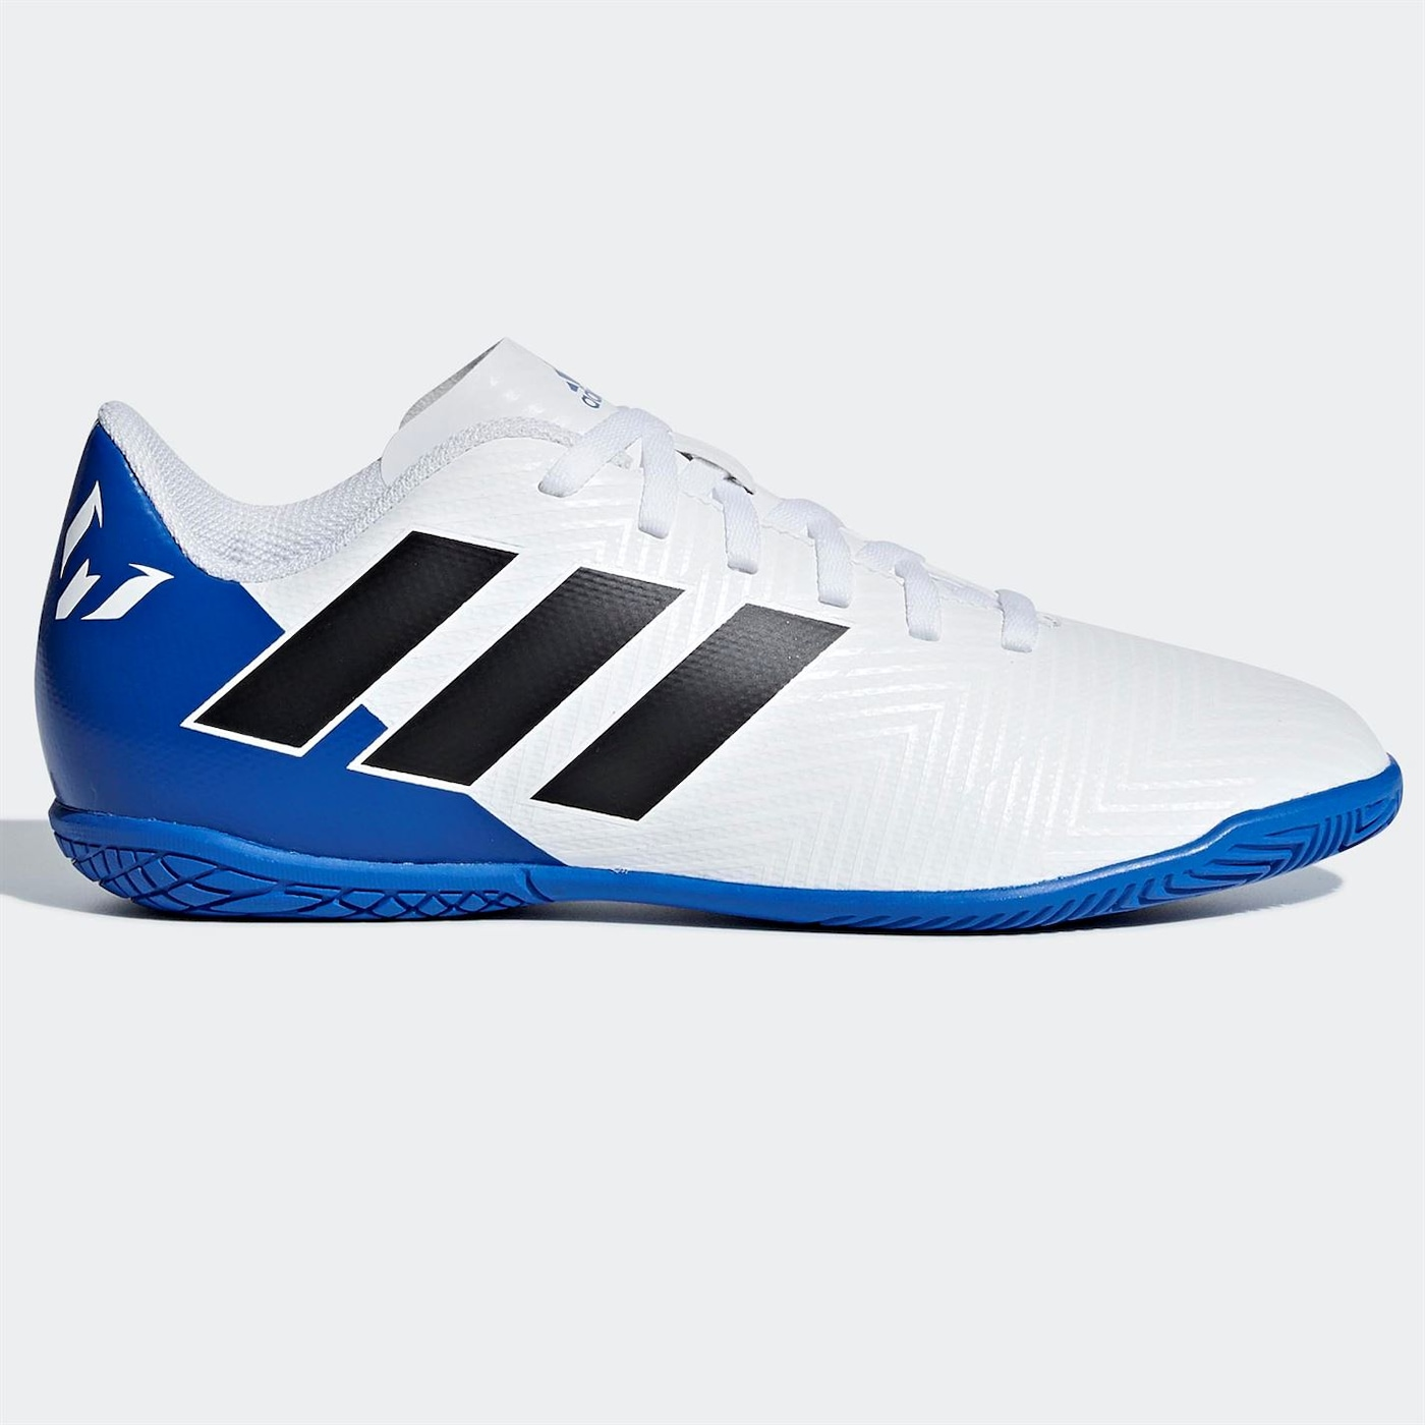 b62ba027e Adidas Nemeziz Messi Tango 18.4 Childrens Indoor Football Trainers